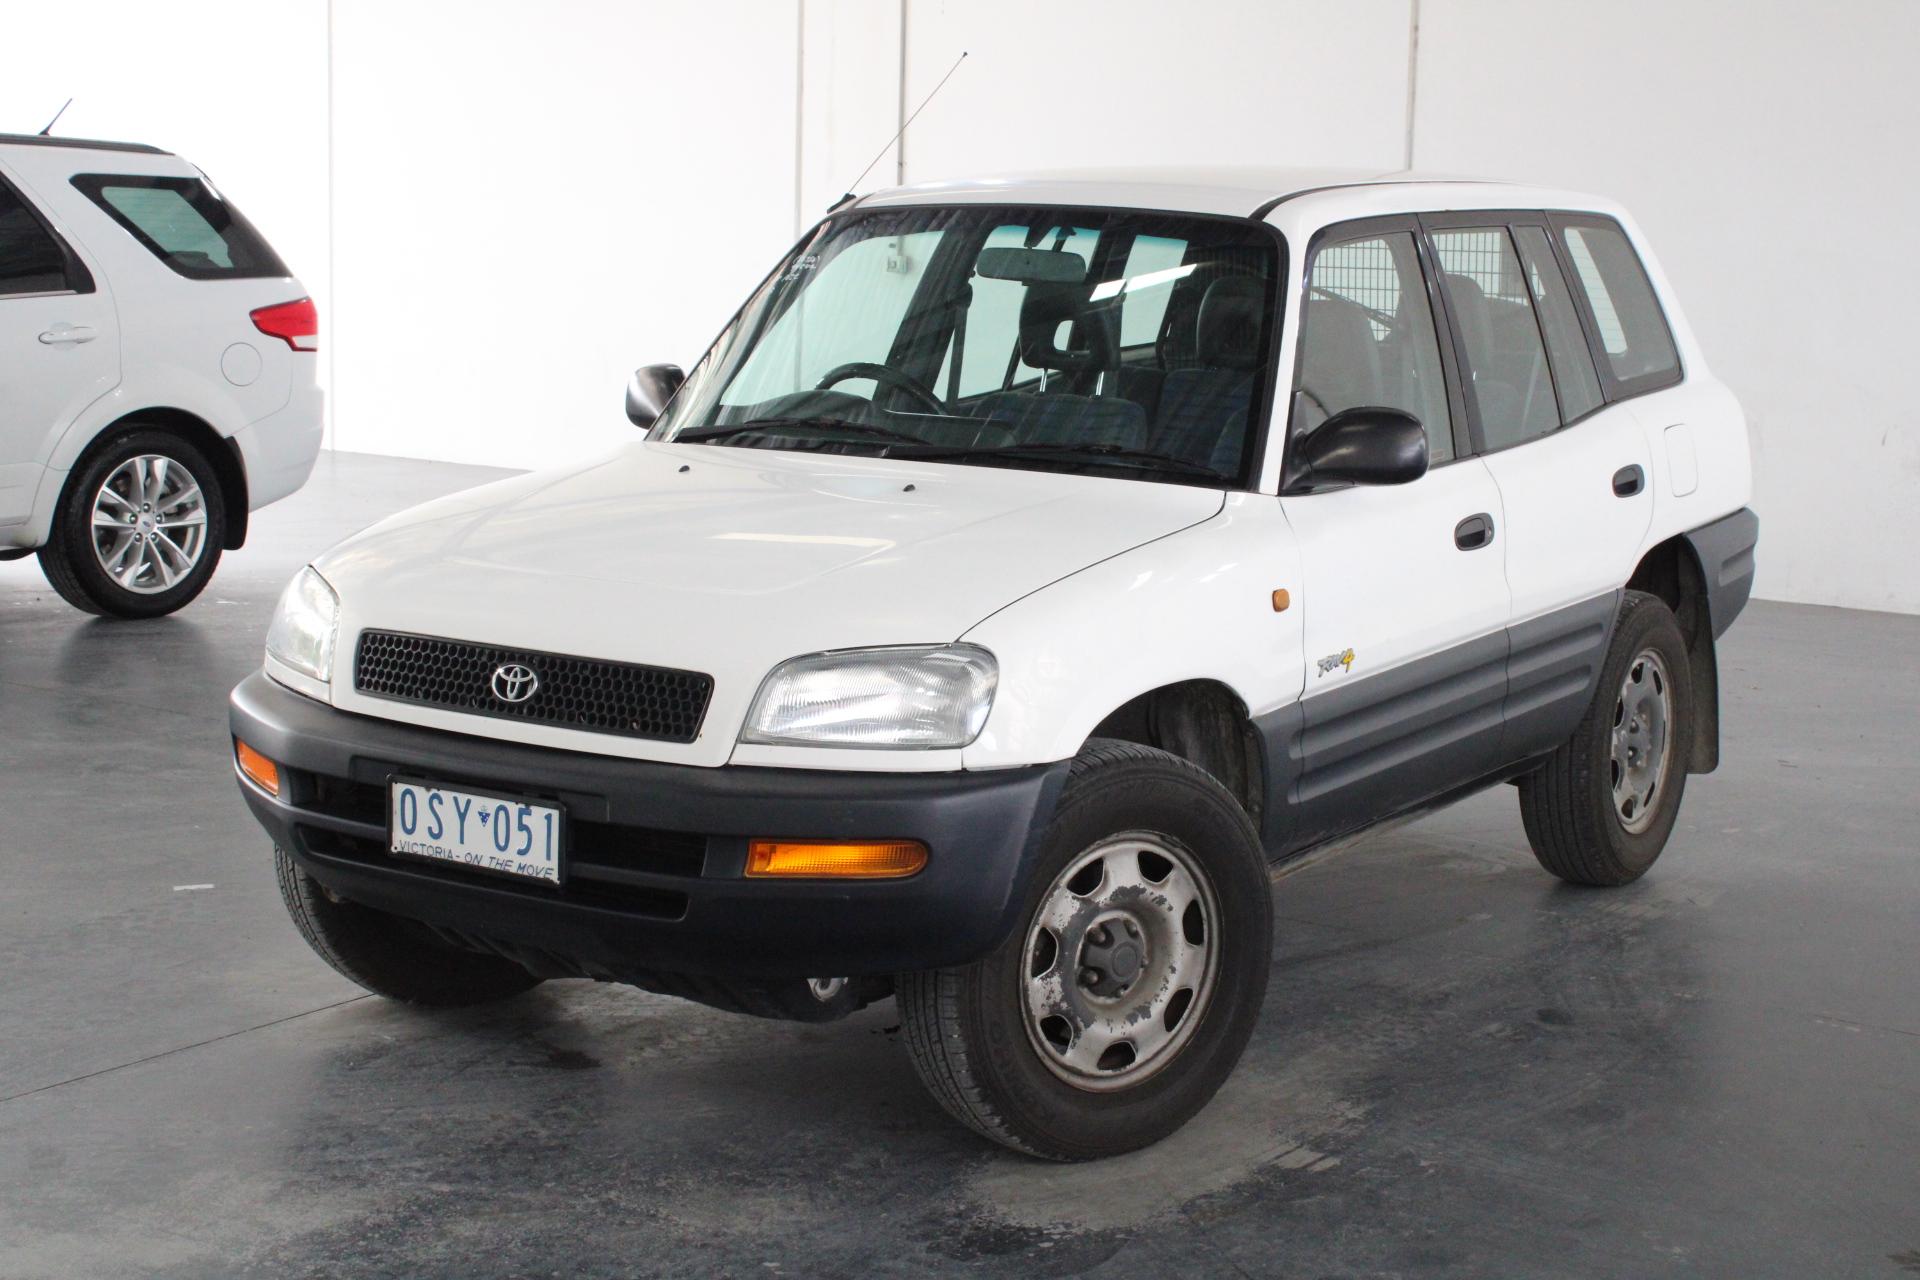 1997 Toyota Rav 4 (4x4) SXA11R Automatic Wagon